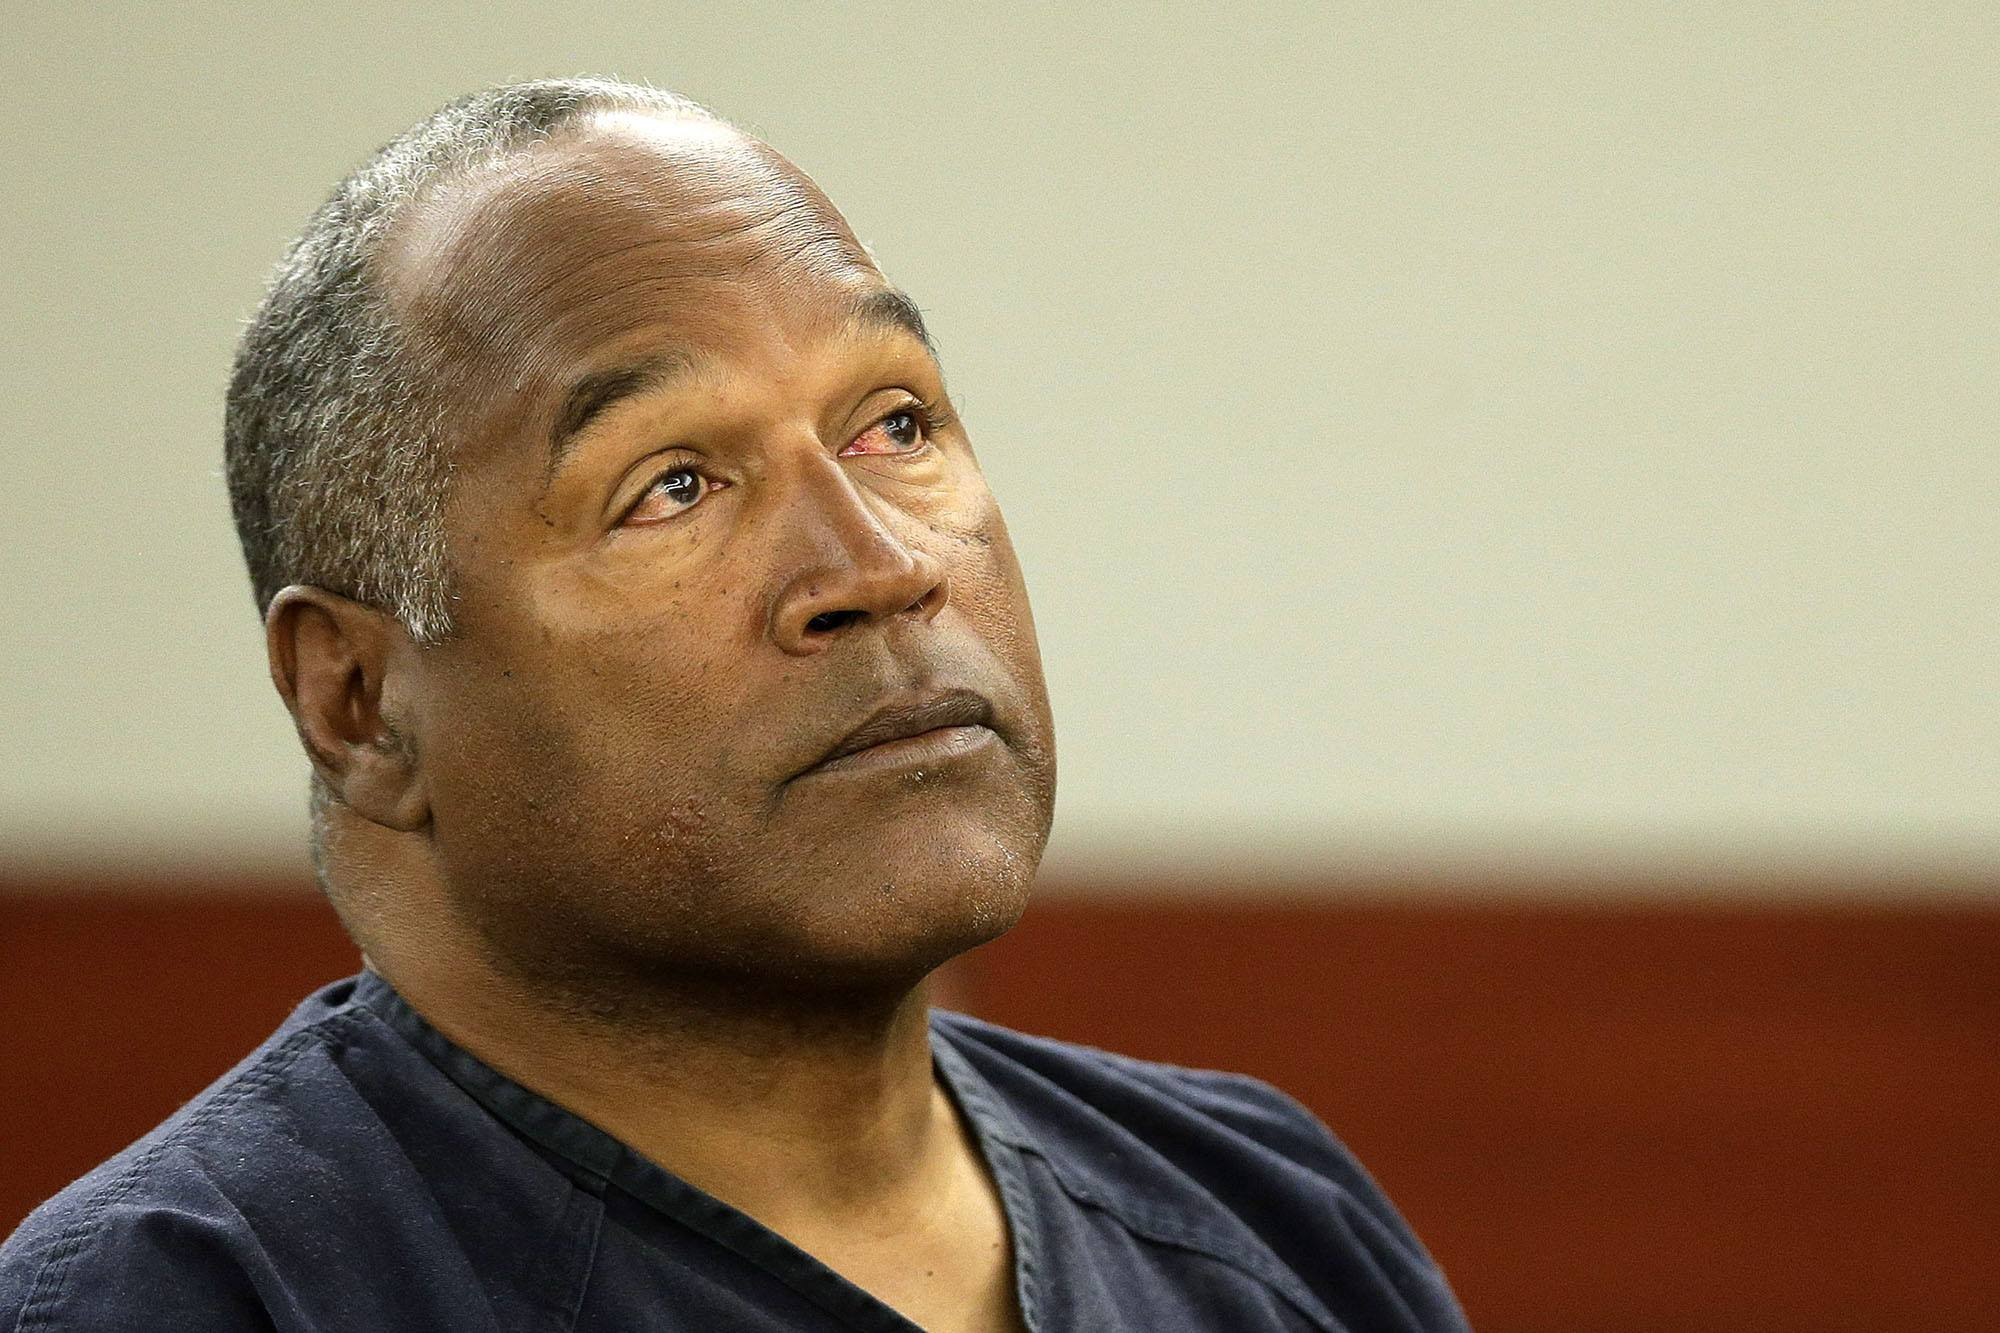 OJ Simpson parole hearing granted